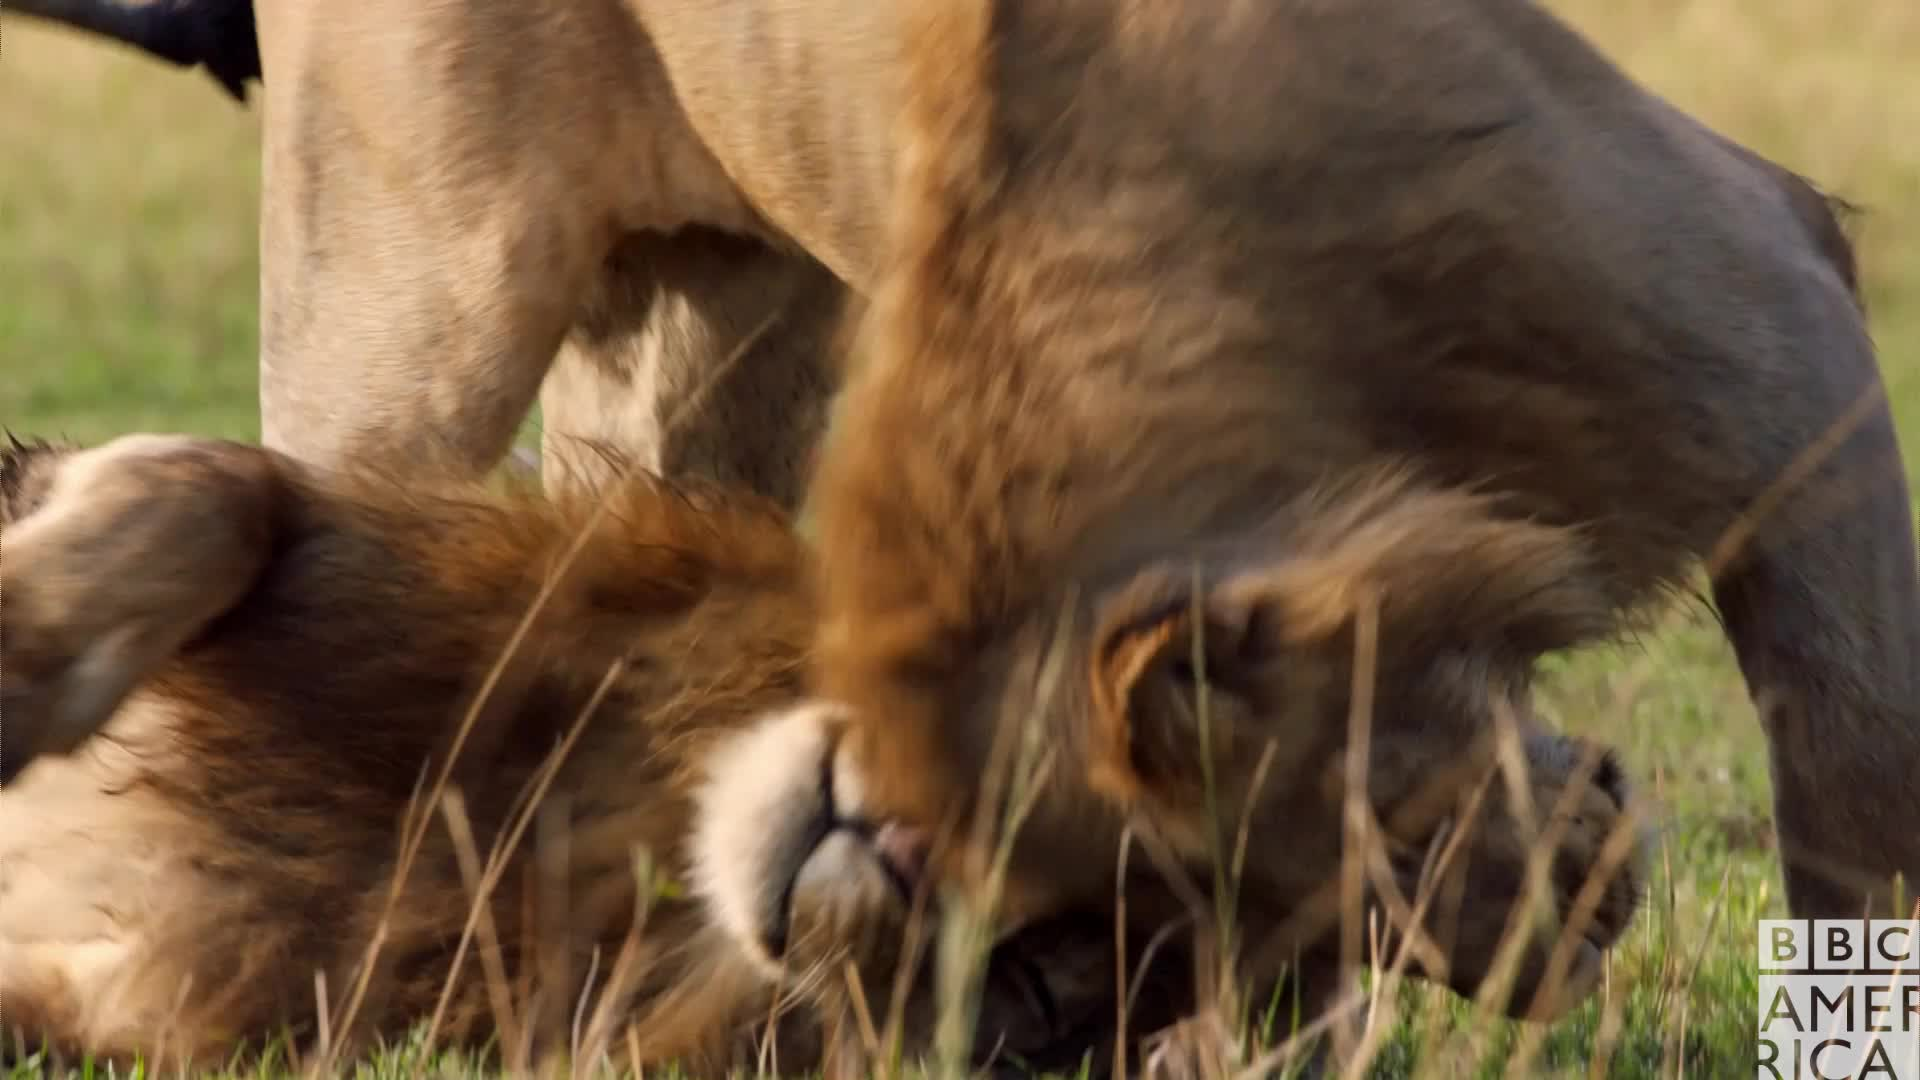 animal, animals, bbc america, bbc america: dynasties, cuddle, dynasties, lion, lions, love, snuggle, tired, Dynasties Lions Tired GIFs